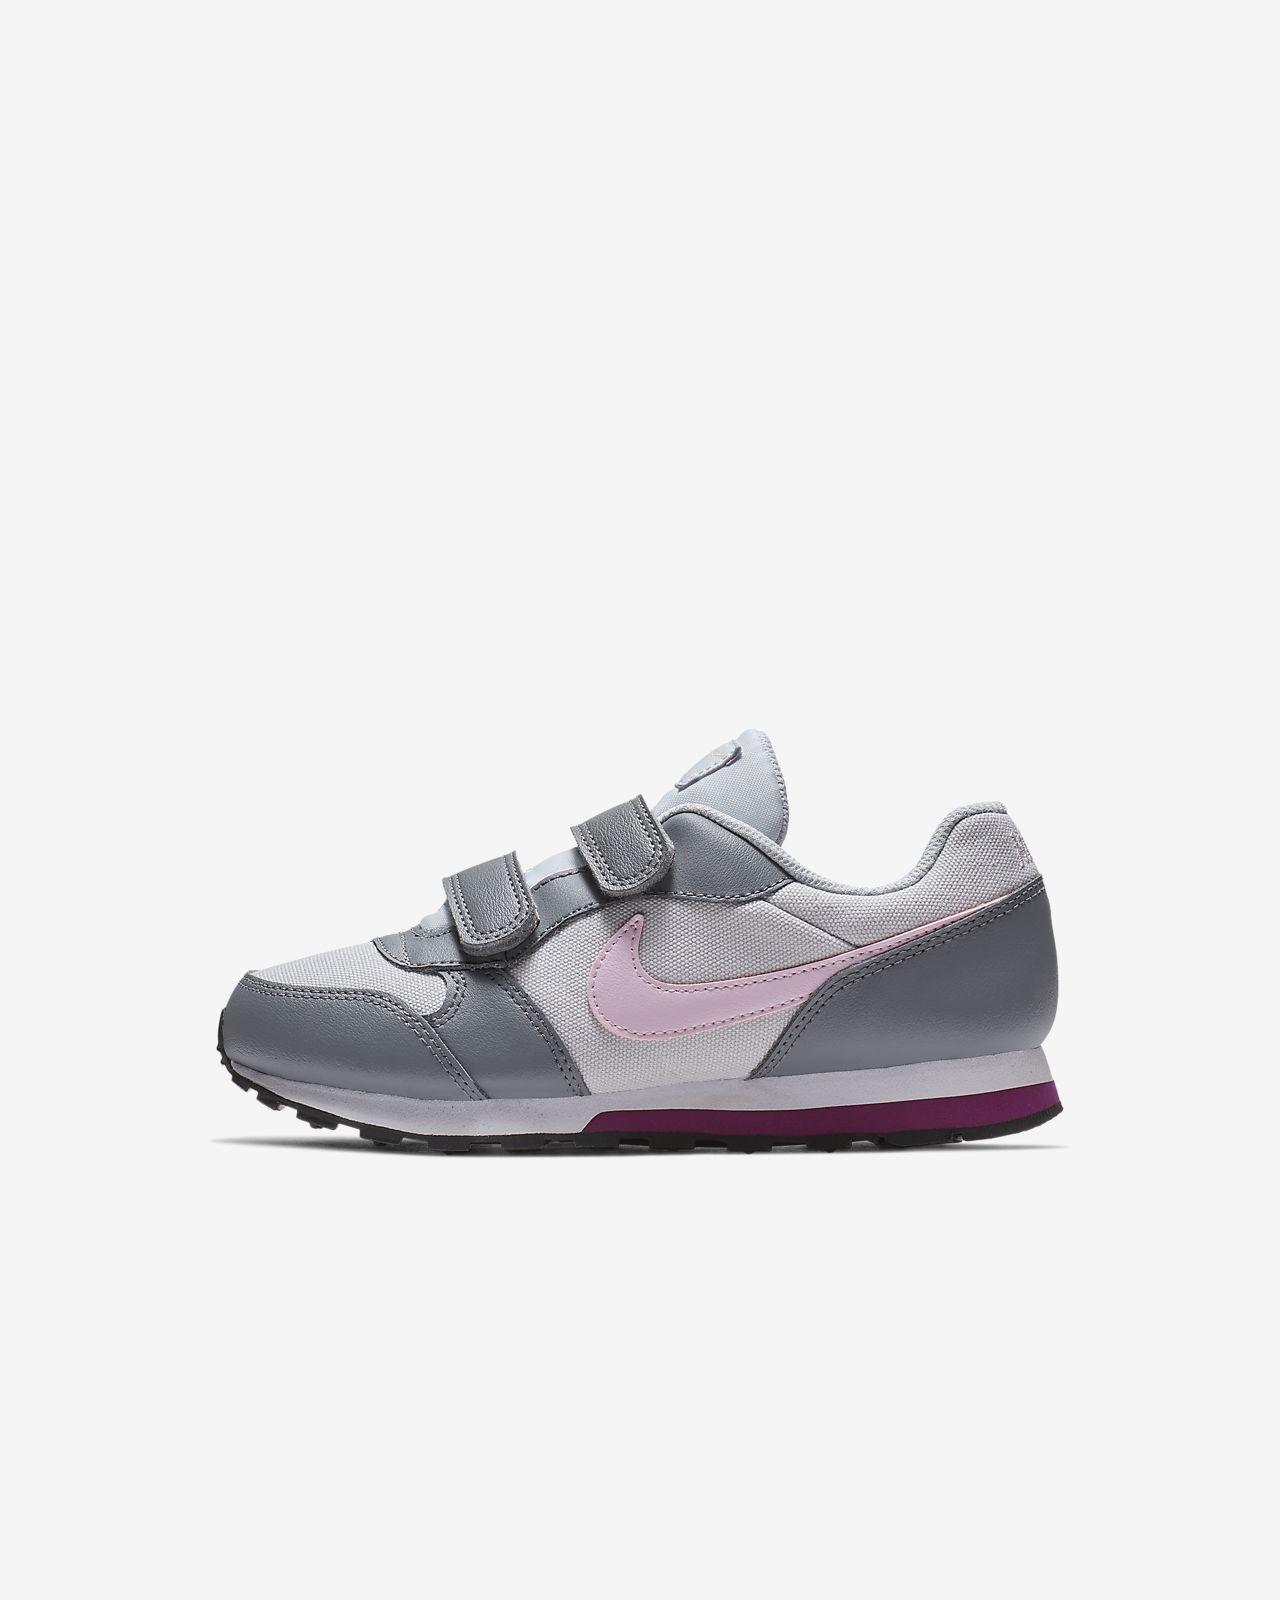 Chaussure 2 Jeune Runner Md Nike Pour EnfantFr 76bfgYy